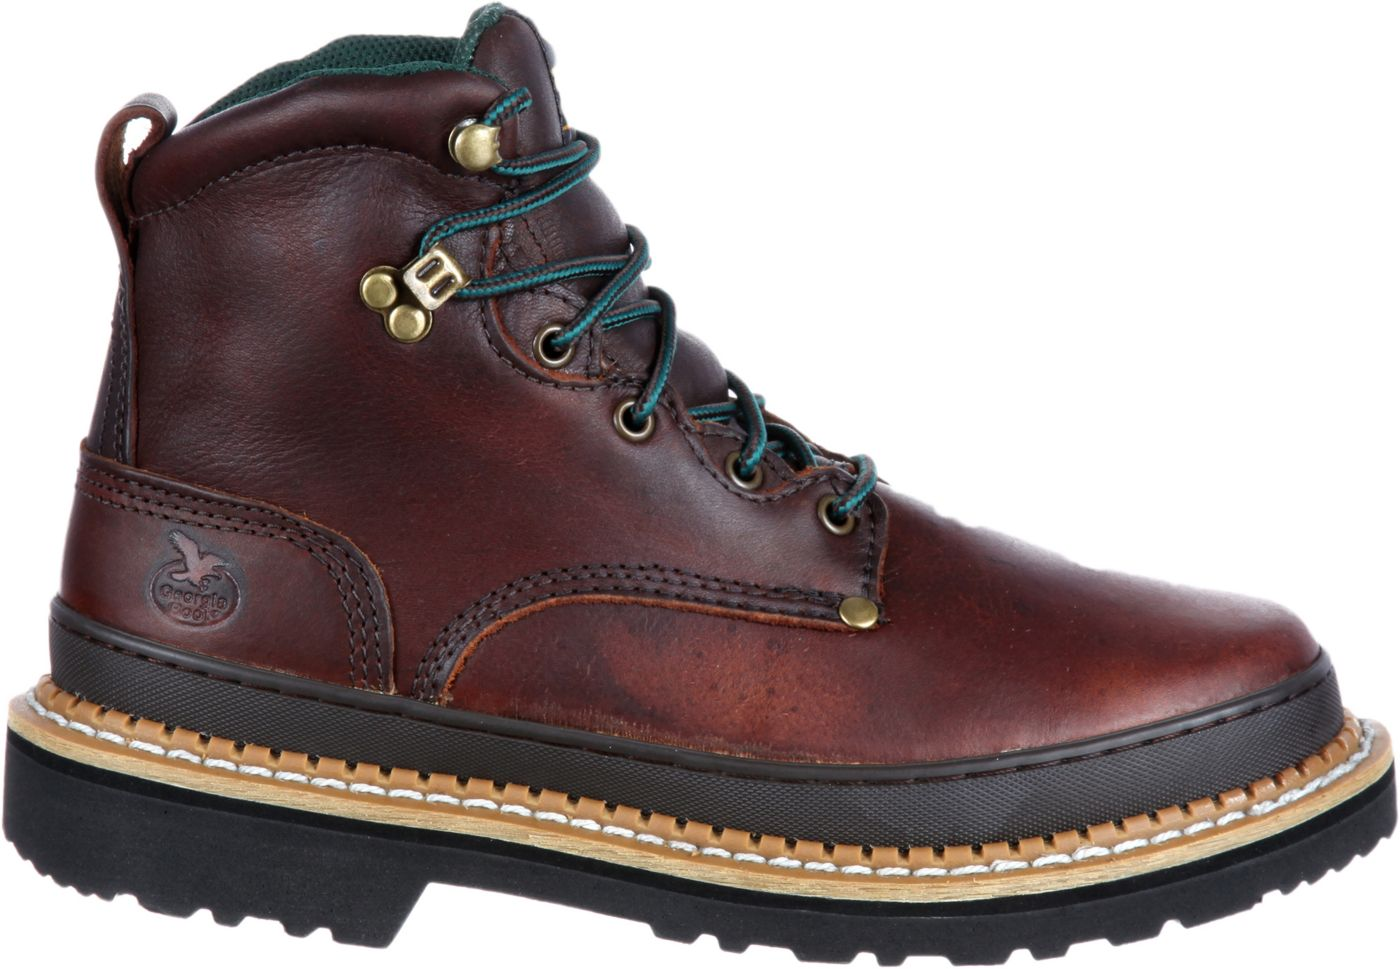 Georgia Boot Men's Giant EH Steel Toe Work Boots